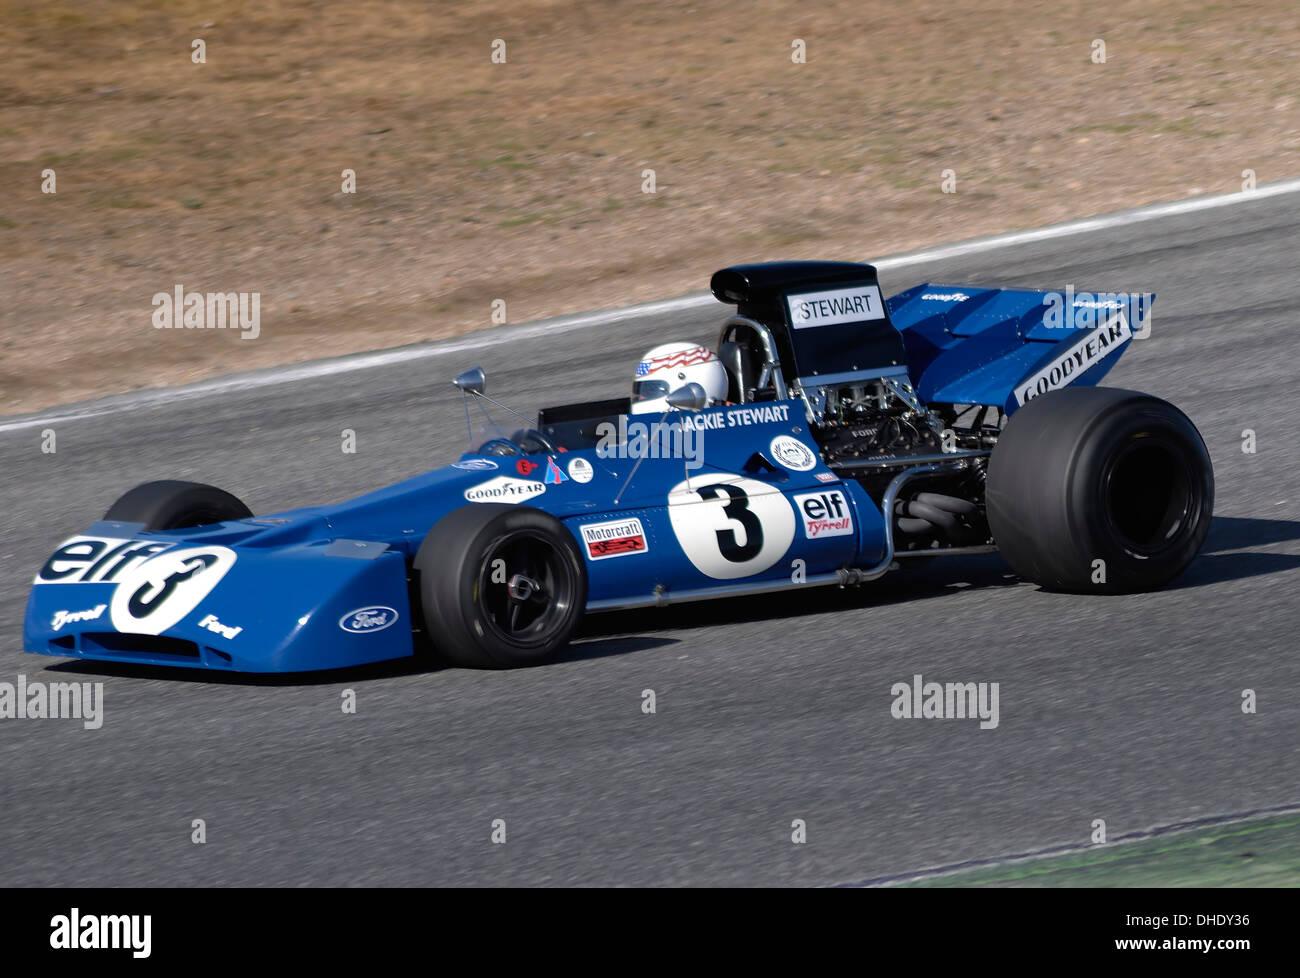 "Jarama Vintage Festival  october 2011. Sir John Young ""Jackie"" Stewart Tyrrell F1. Jarama circuit, Madrid, Spain. Stock Photo"